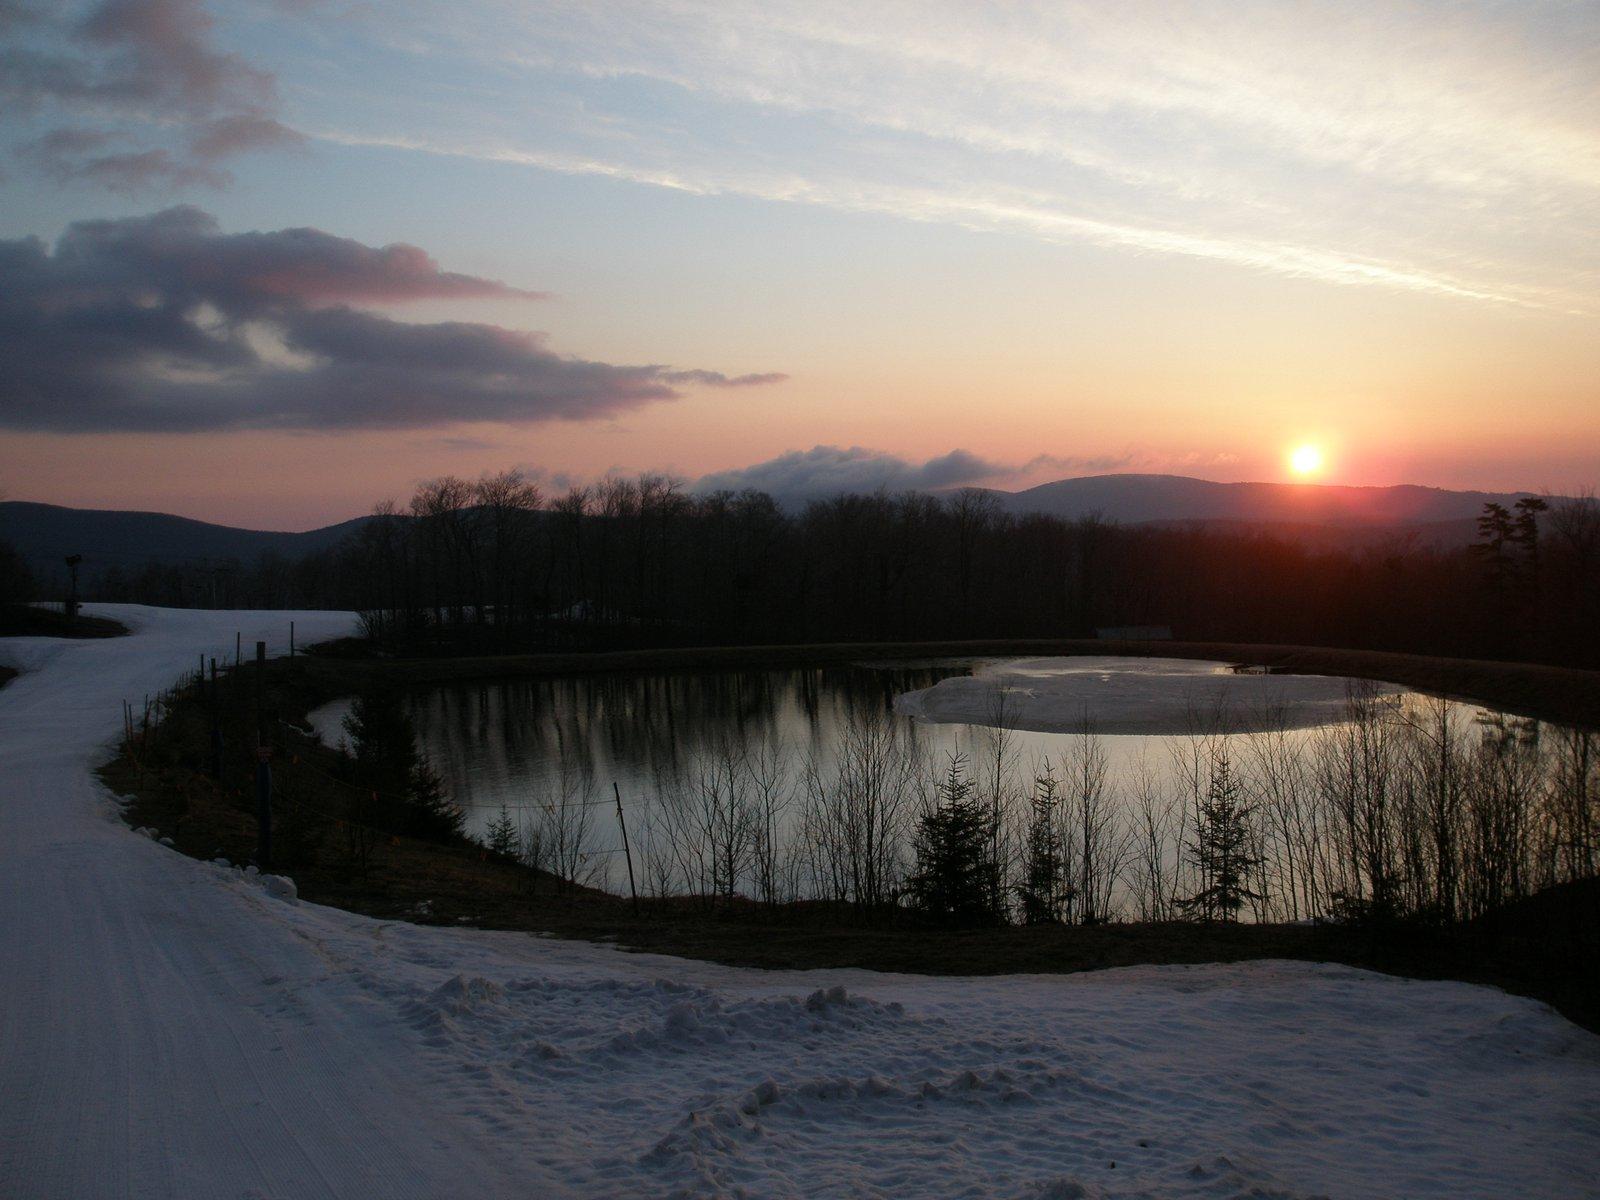 Sunrise over snowmaking pond